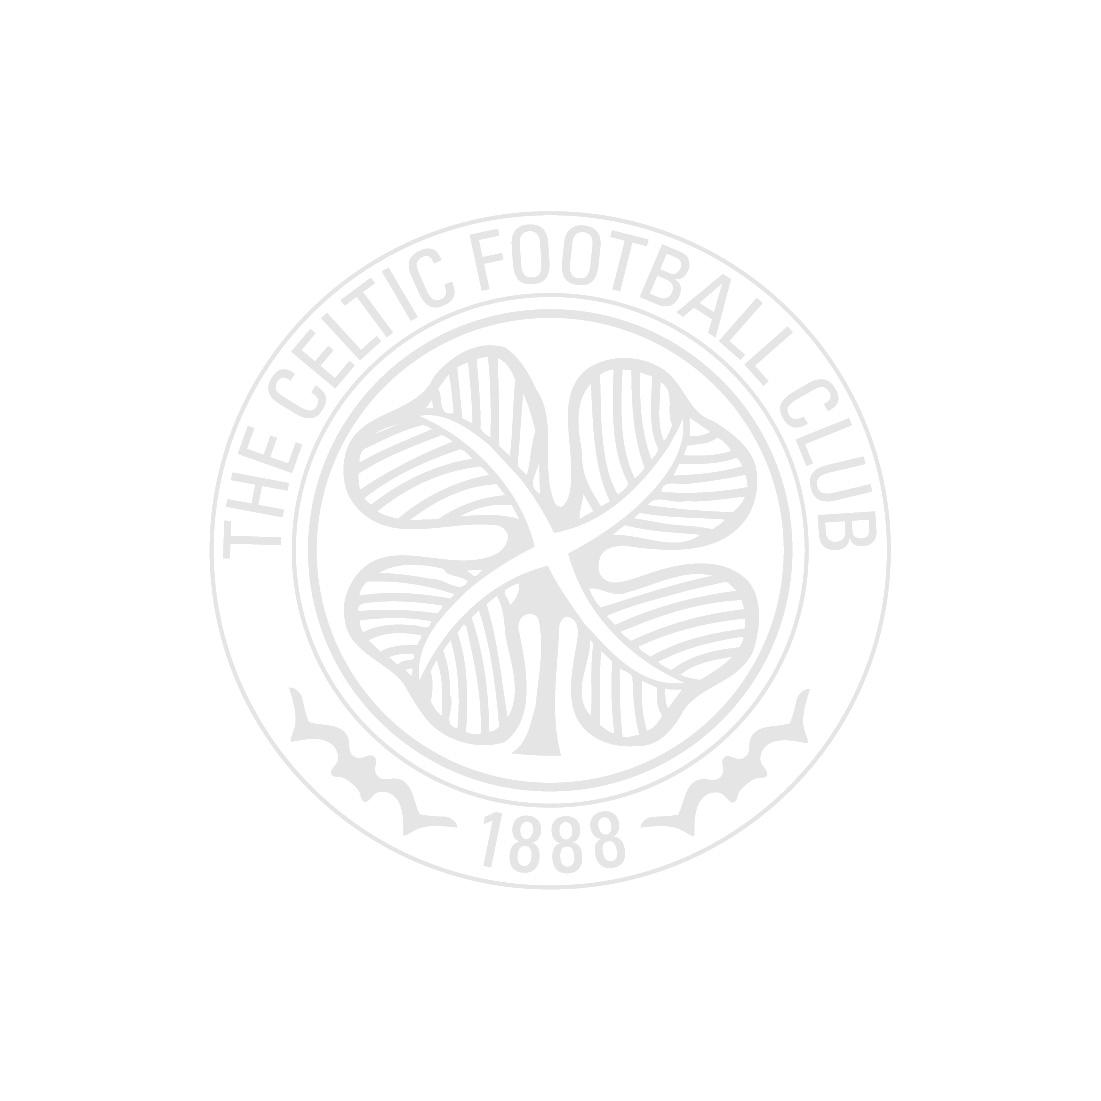 Celtic FC Waterbased Print T-shirt